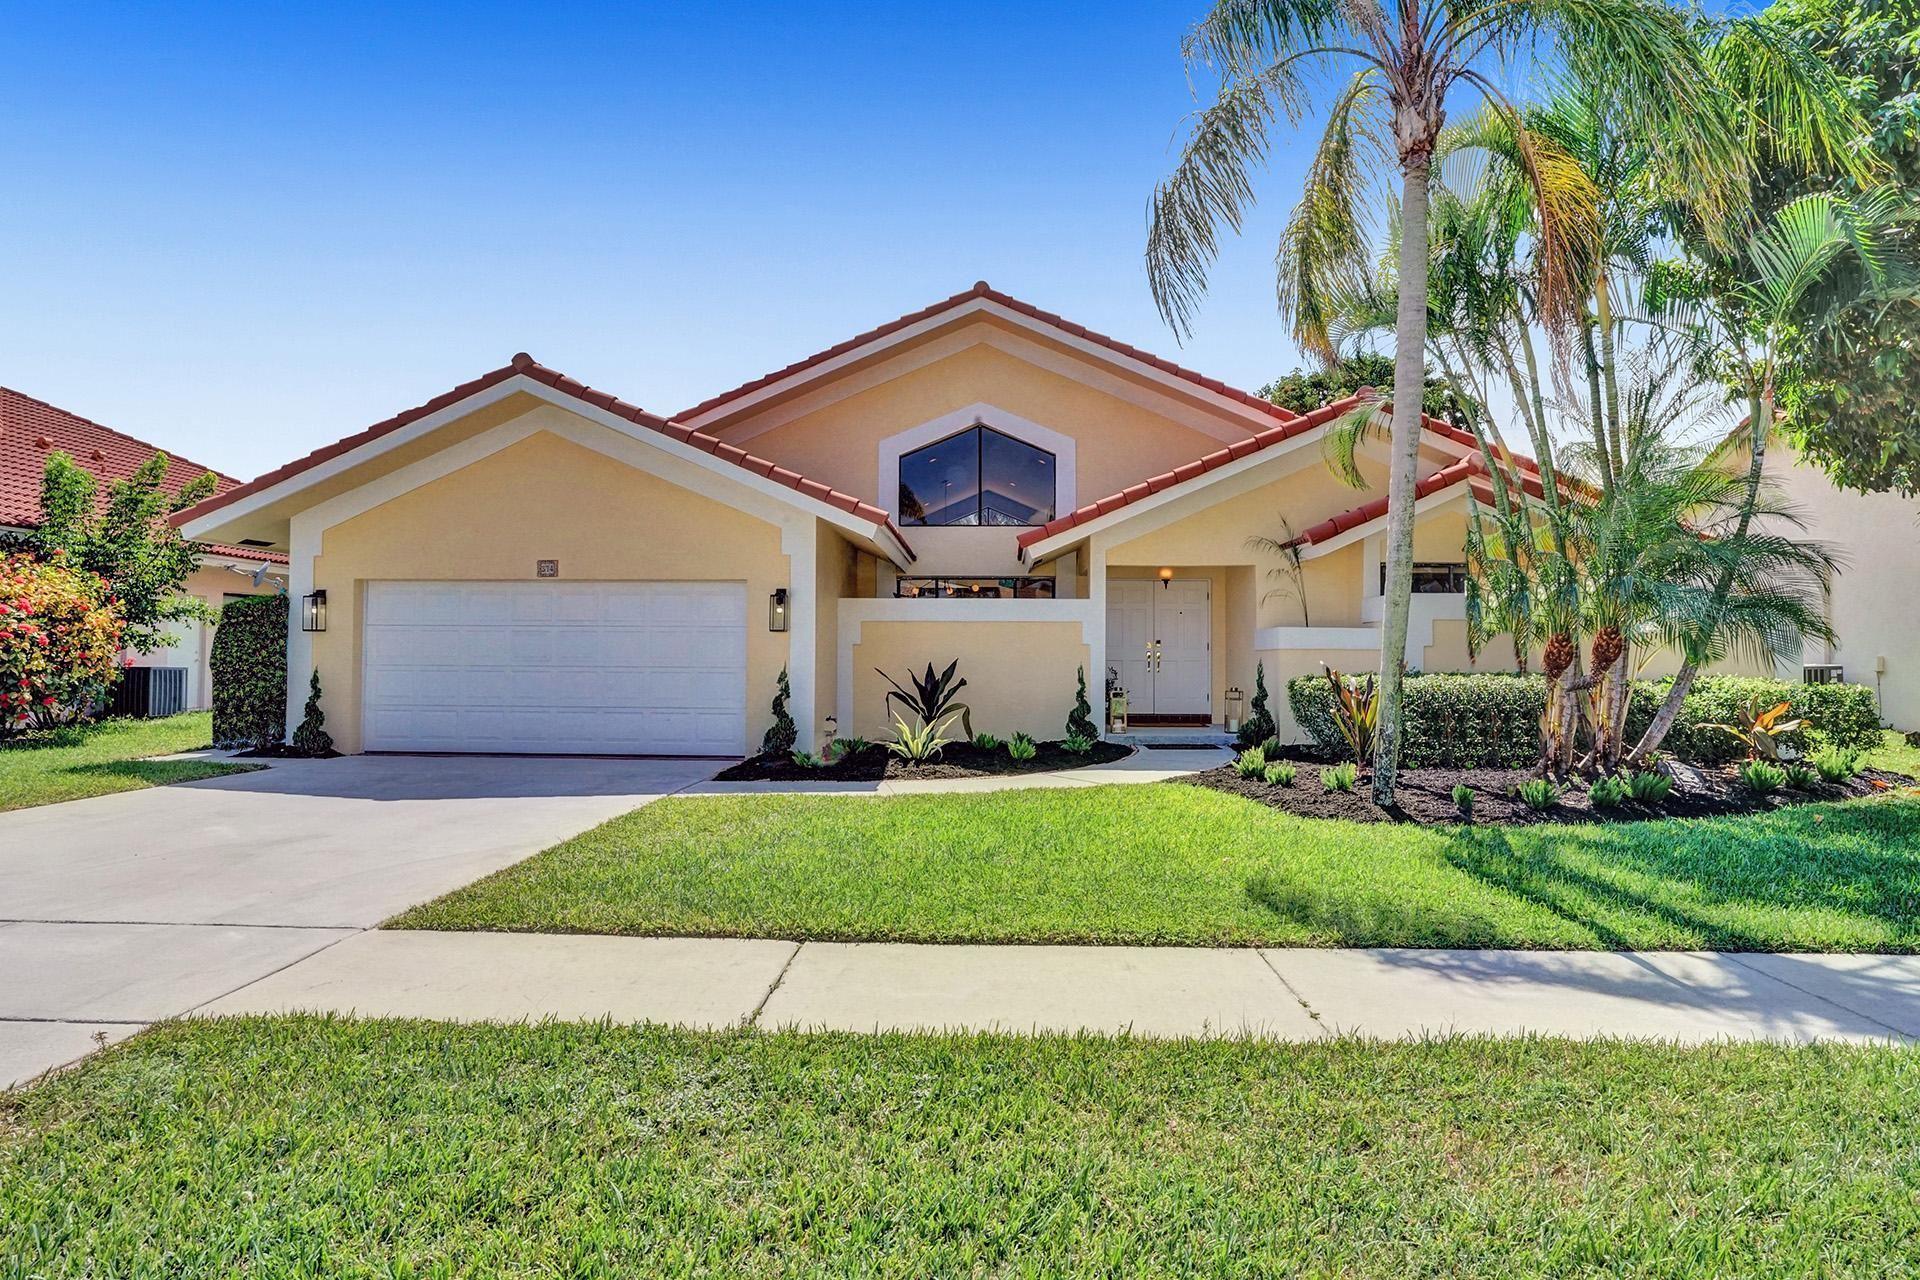 374 Prairie Rose Lane, Boca Raton, FL 33487 - #: RX-10735377